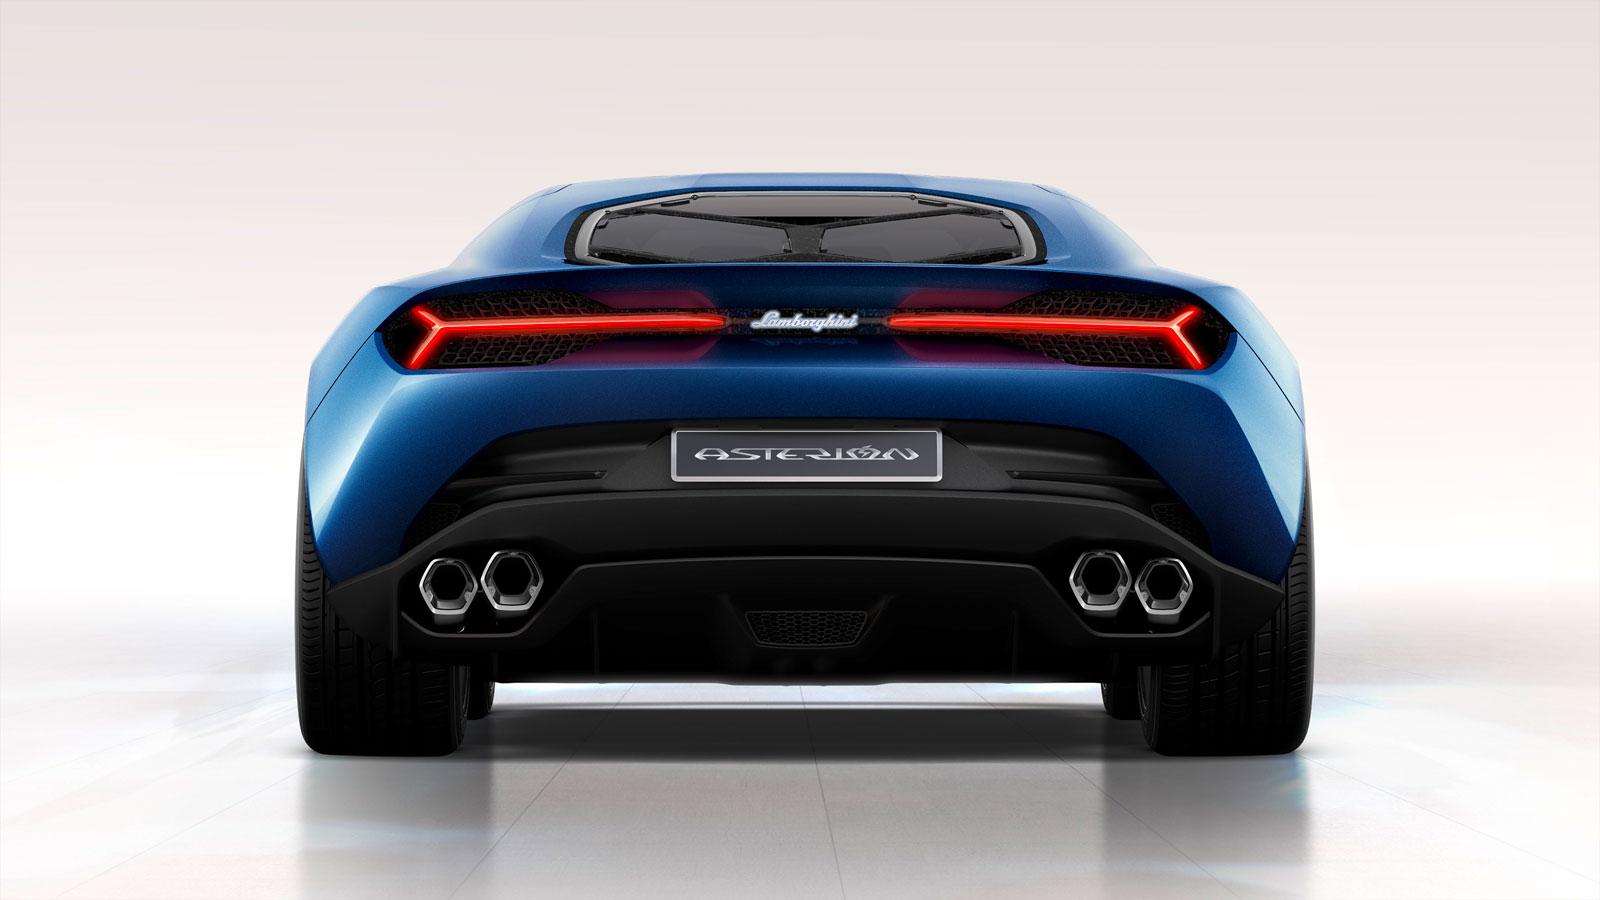 Lamborghini Asterion Lpi 910 4 Car Body Design